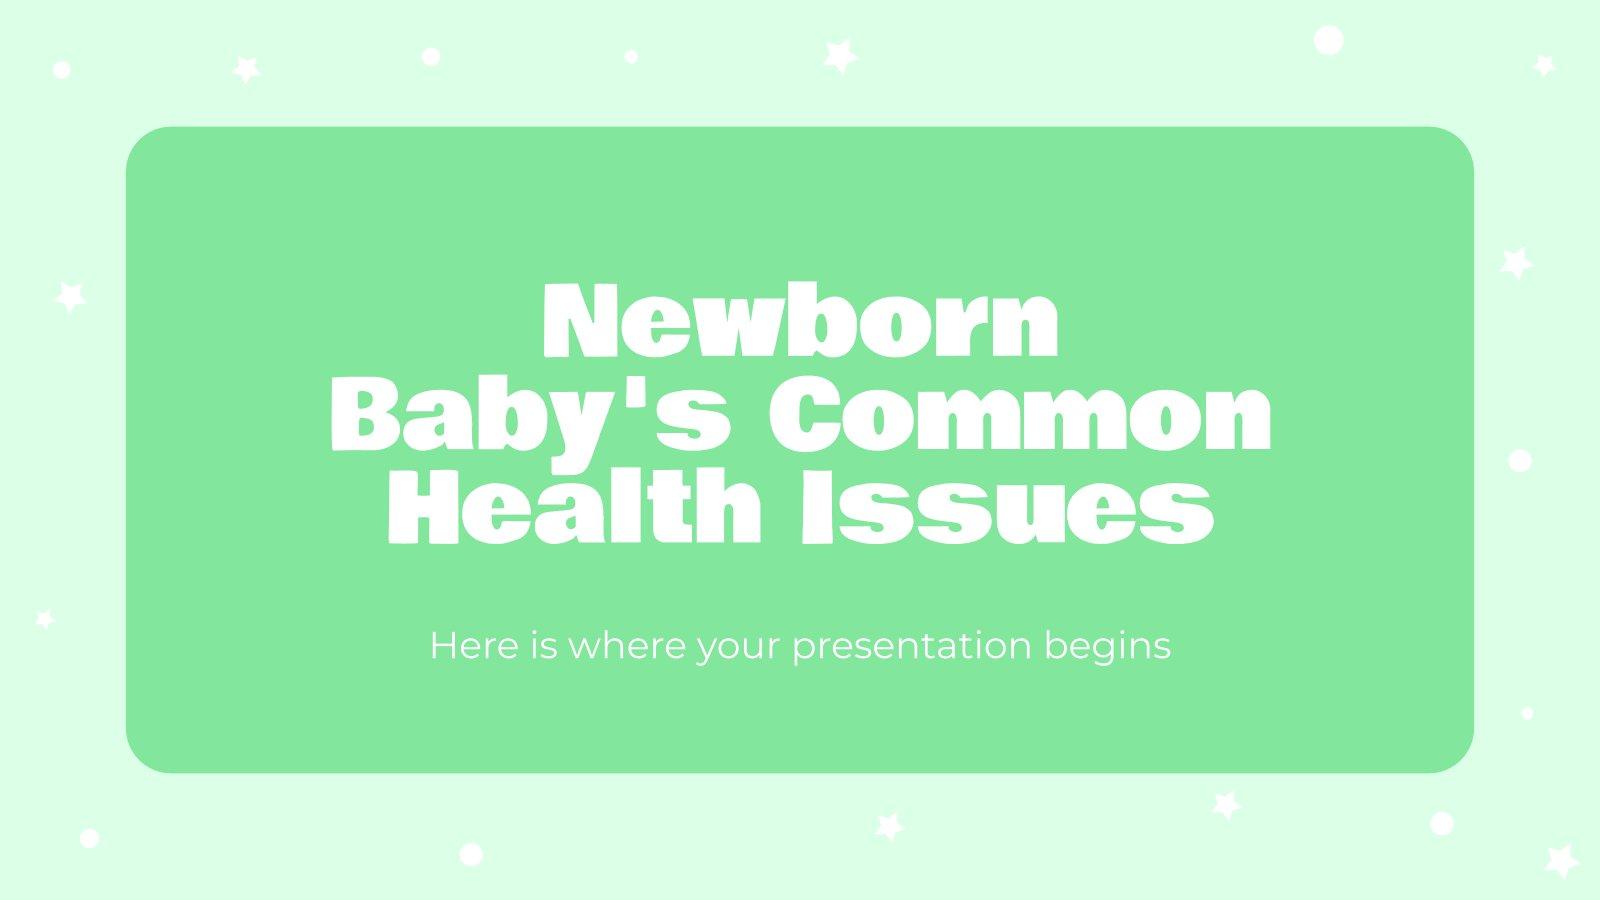 Newborn Baby's Common Health Issues presentation template